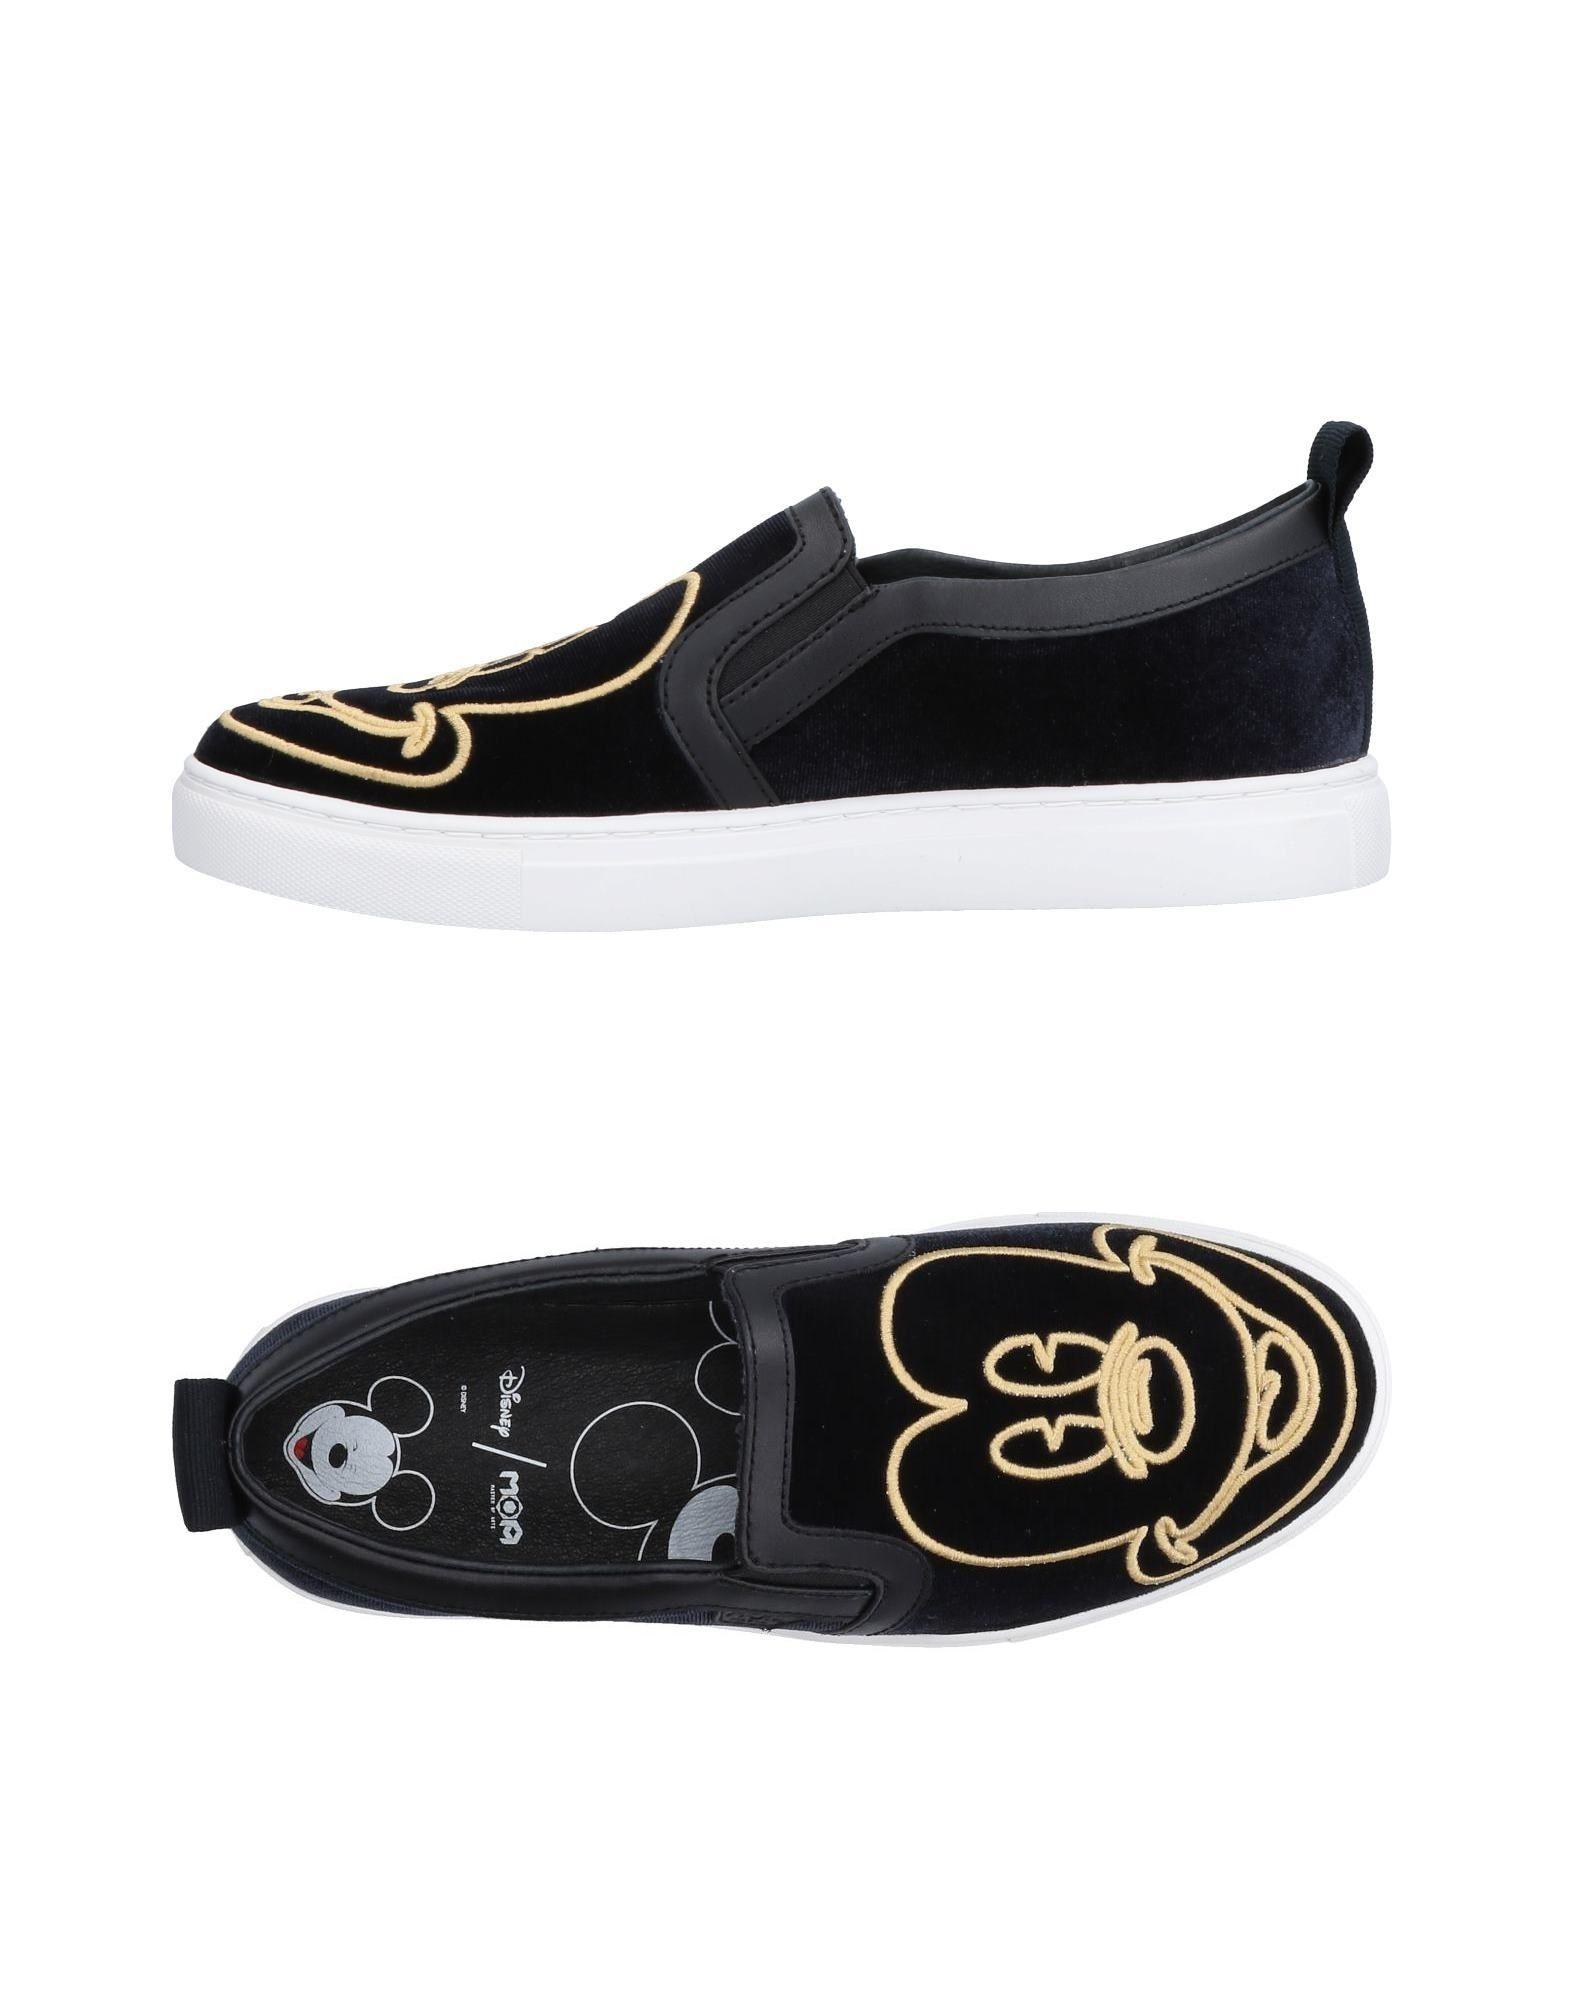 Gut um billige Schuhe zu Sneakers tragenMoa Master Of Arts Sneakers zu Damen  11509848AV 6e1019